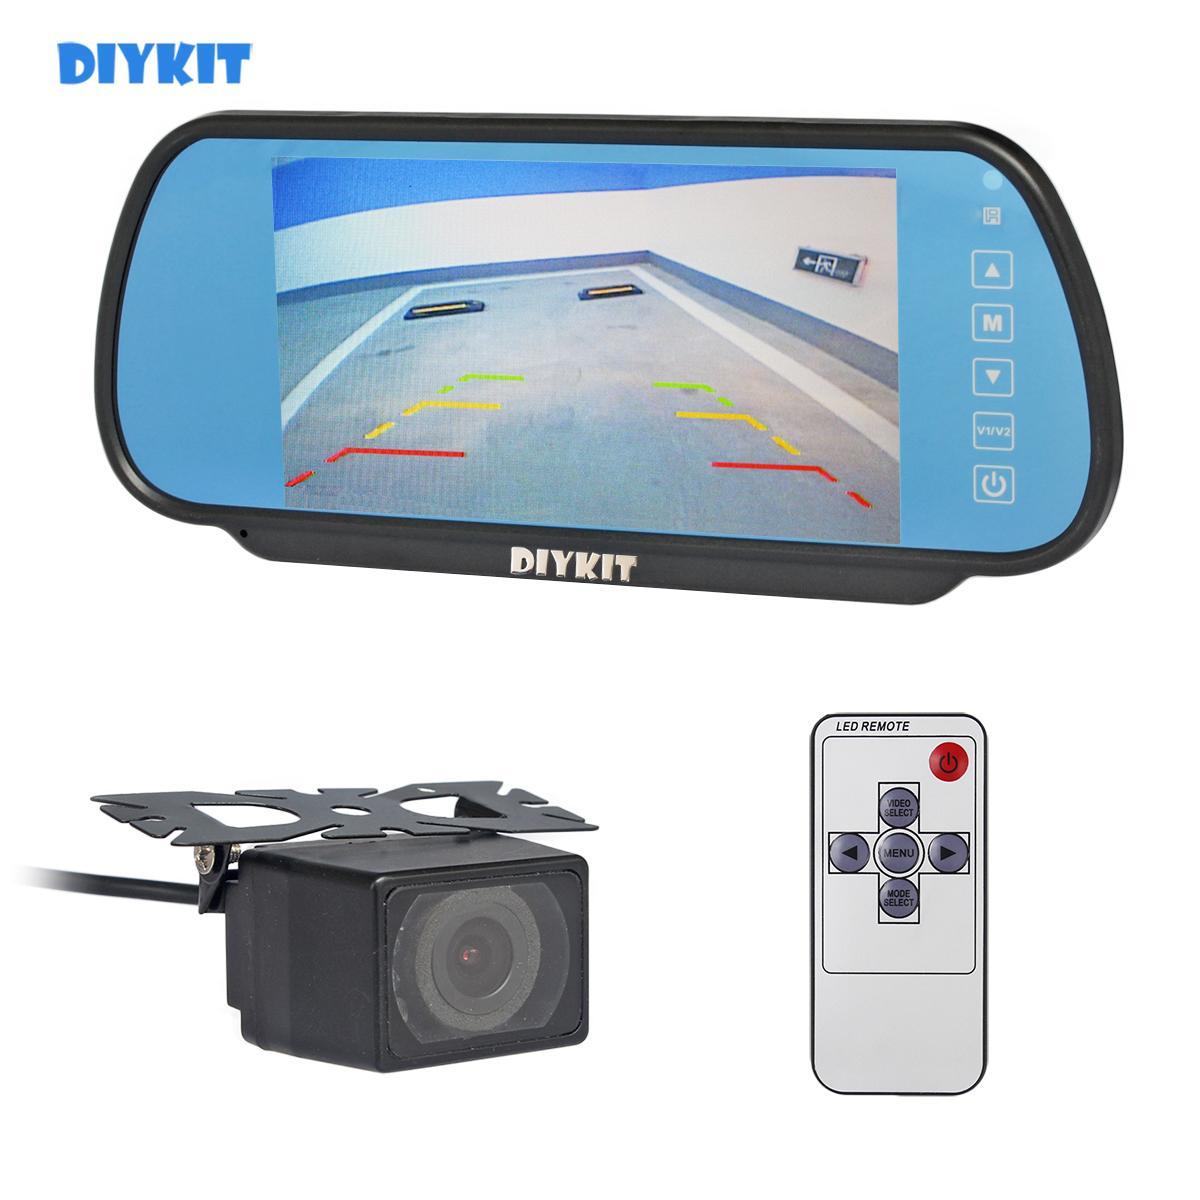 "DIYKIT 7"" Ver LCD retrovisor monitor do carro monitor + IR Night Vision Rear Camera Car Estacionamento Assistência Kit Sistema"